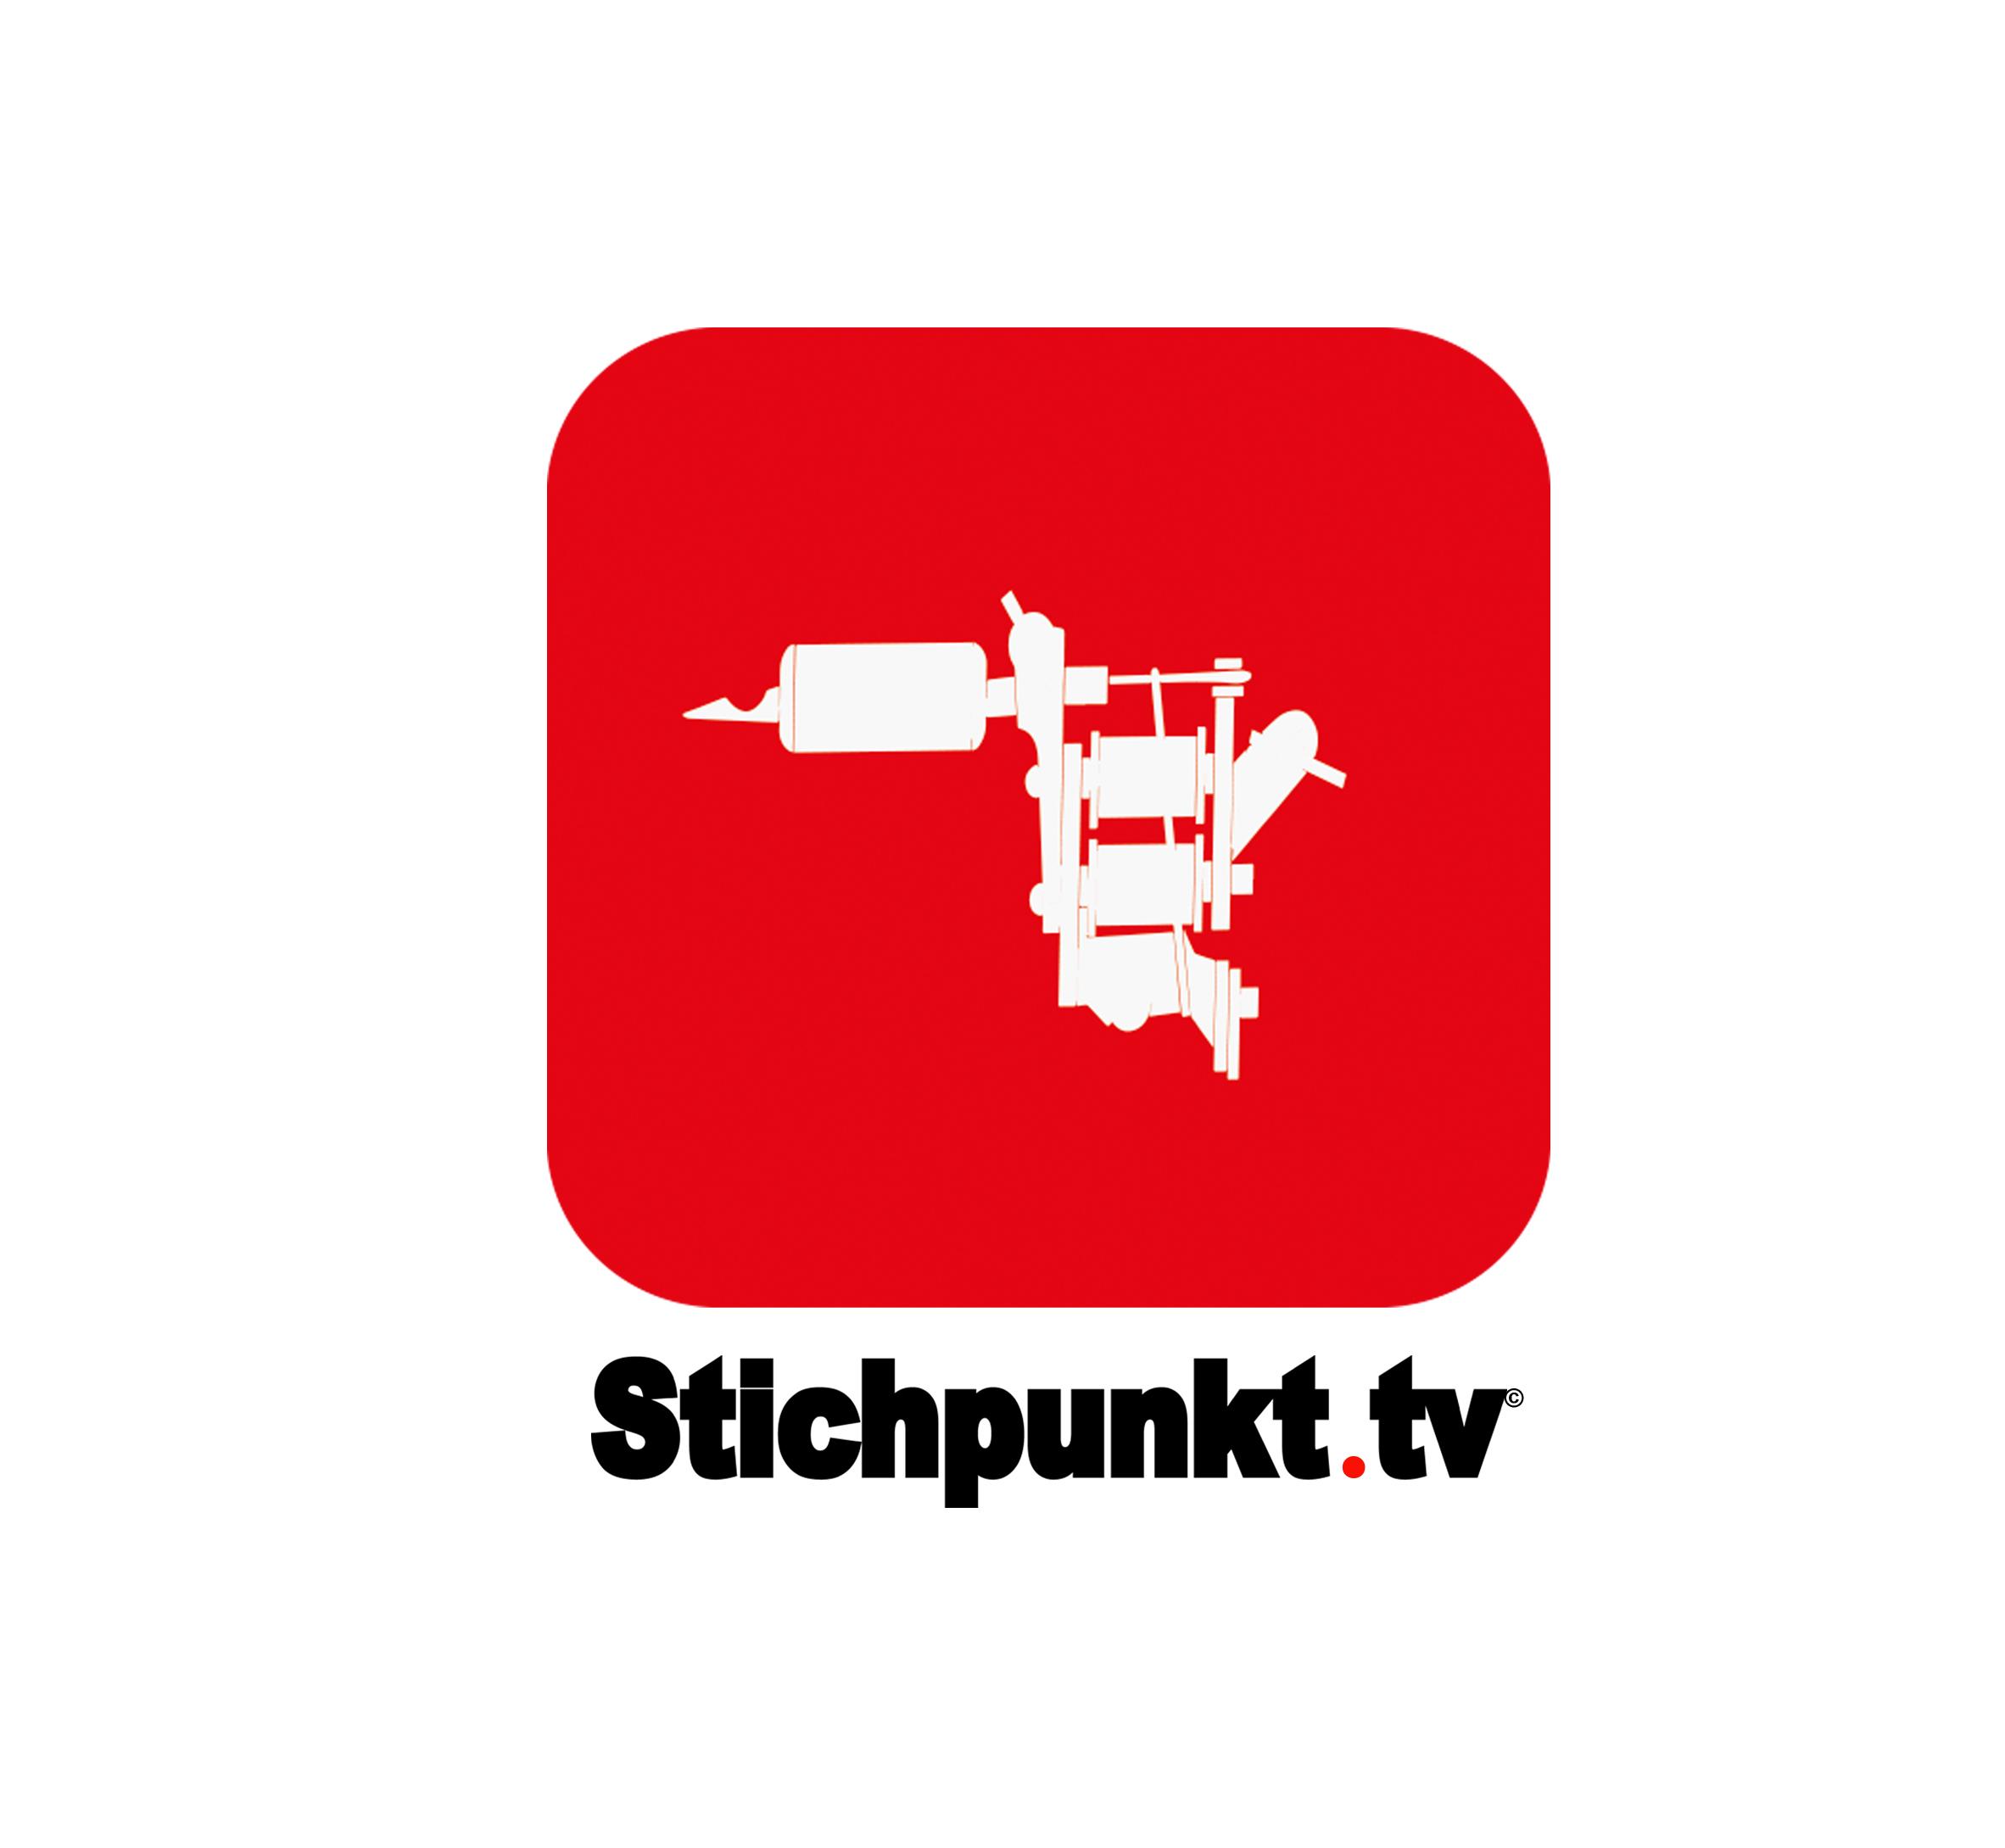 stichpunkt.tv in frankfurt